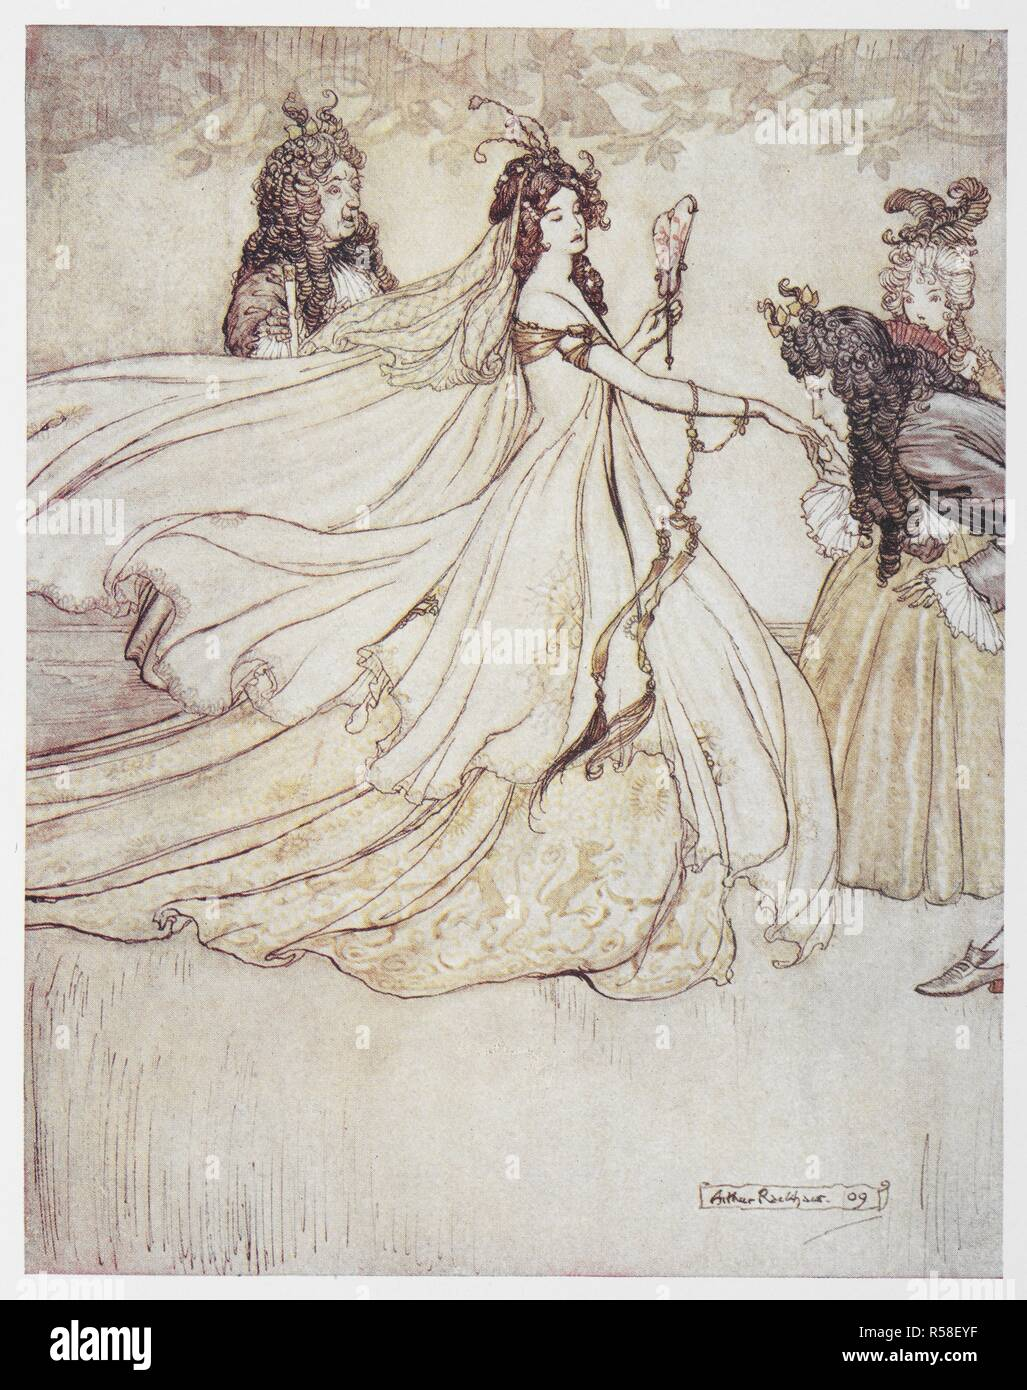 Cinderella (Ashenputtel) in a ball gown. Grimm's Fairy Tales. Illustrated by Arthur Rackham. London : William Heinemann, [1925]. 'Ashenputtel goes to the ball.'. Source: 12410.r.7. facing page 192. Author: RACKHAM, ARTHUR. GEBRUEDER GRIMM. Stock Photo